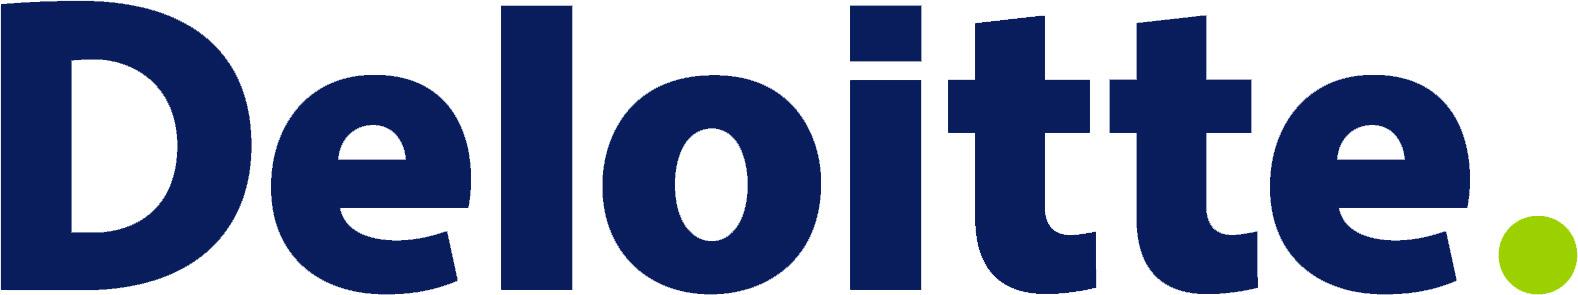 Deloitte logo - The Gift Trust testimonials